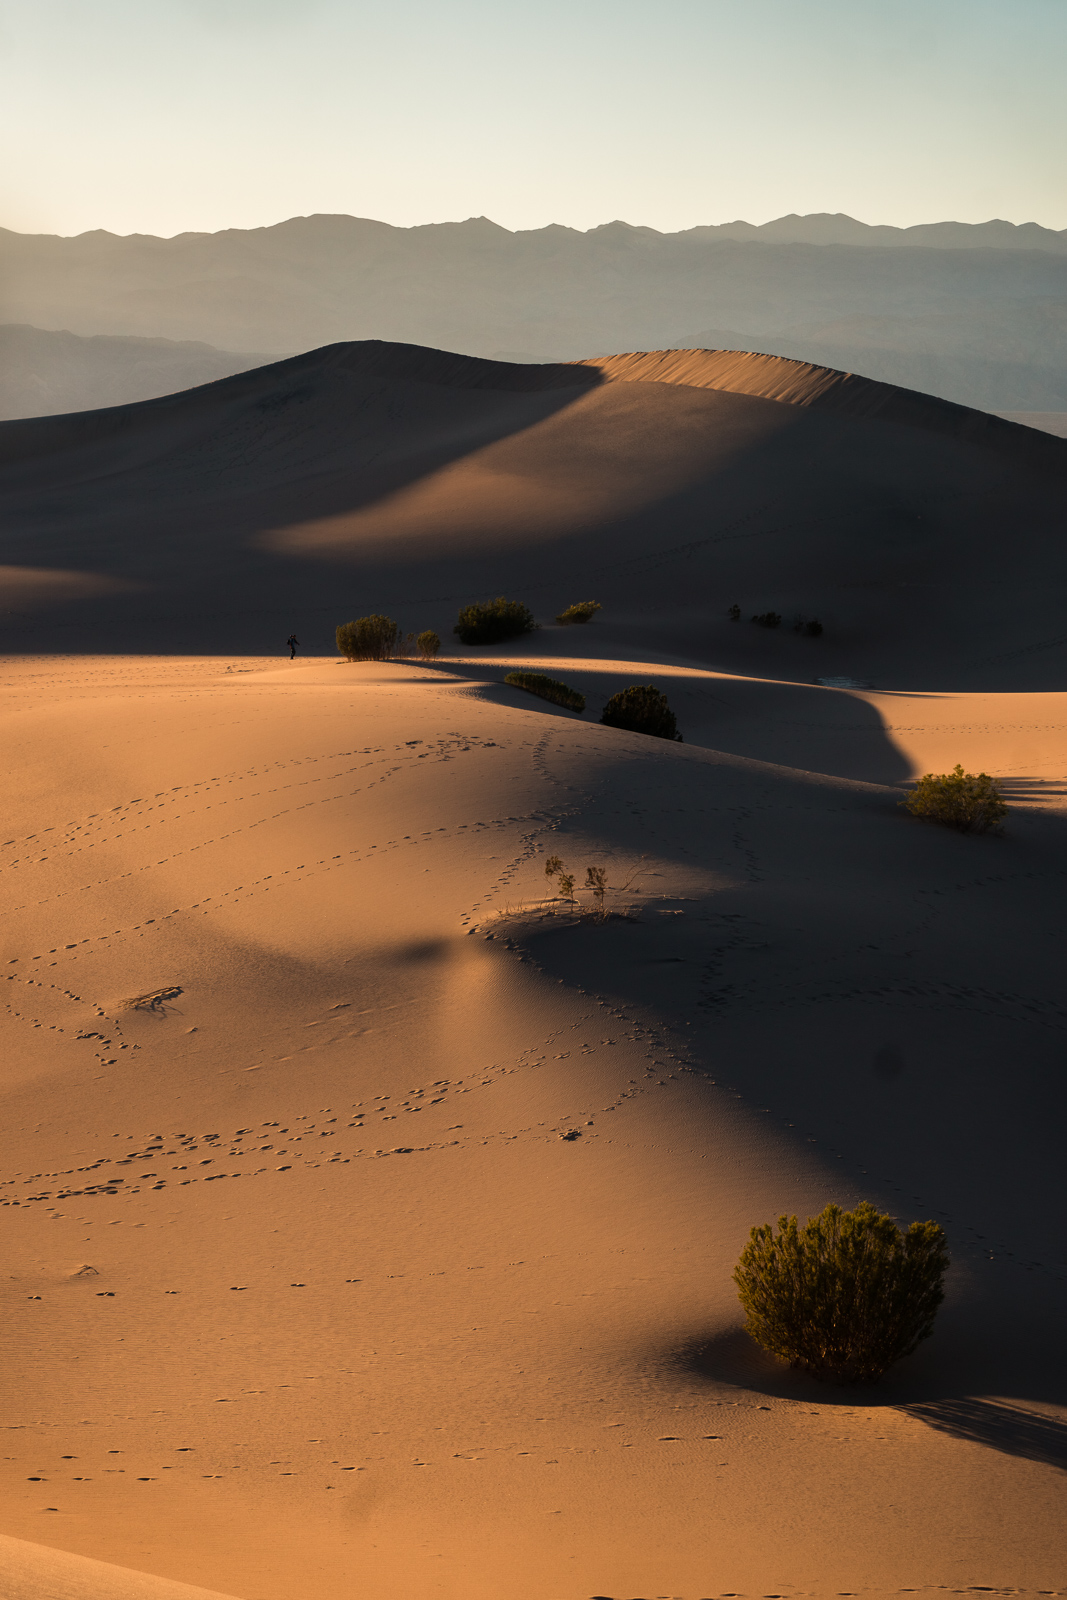 8_Death-Valley-dunes-landscape_Joseph-Barber-Studios.jpg